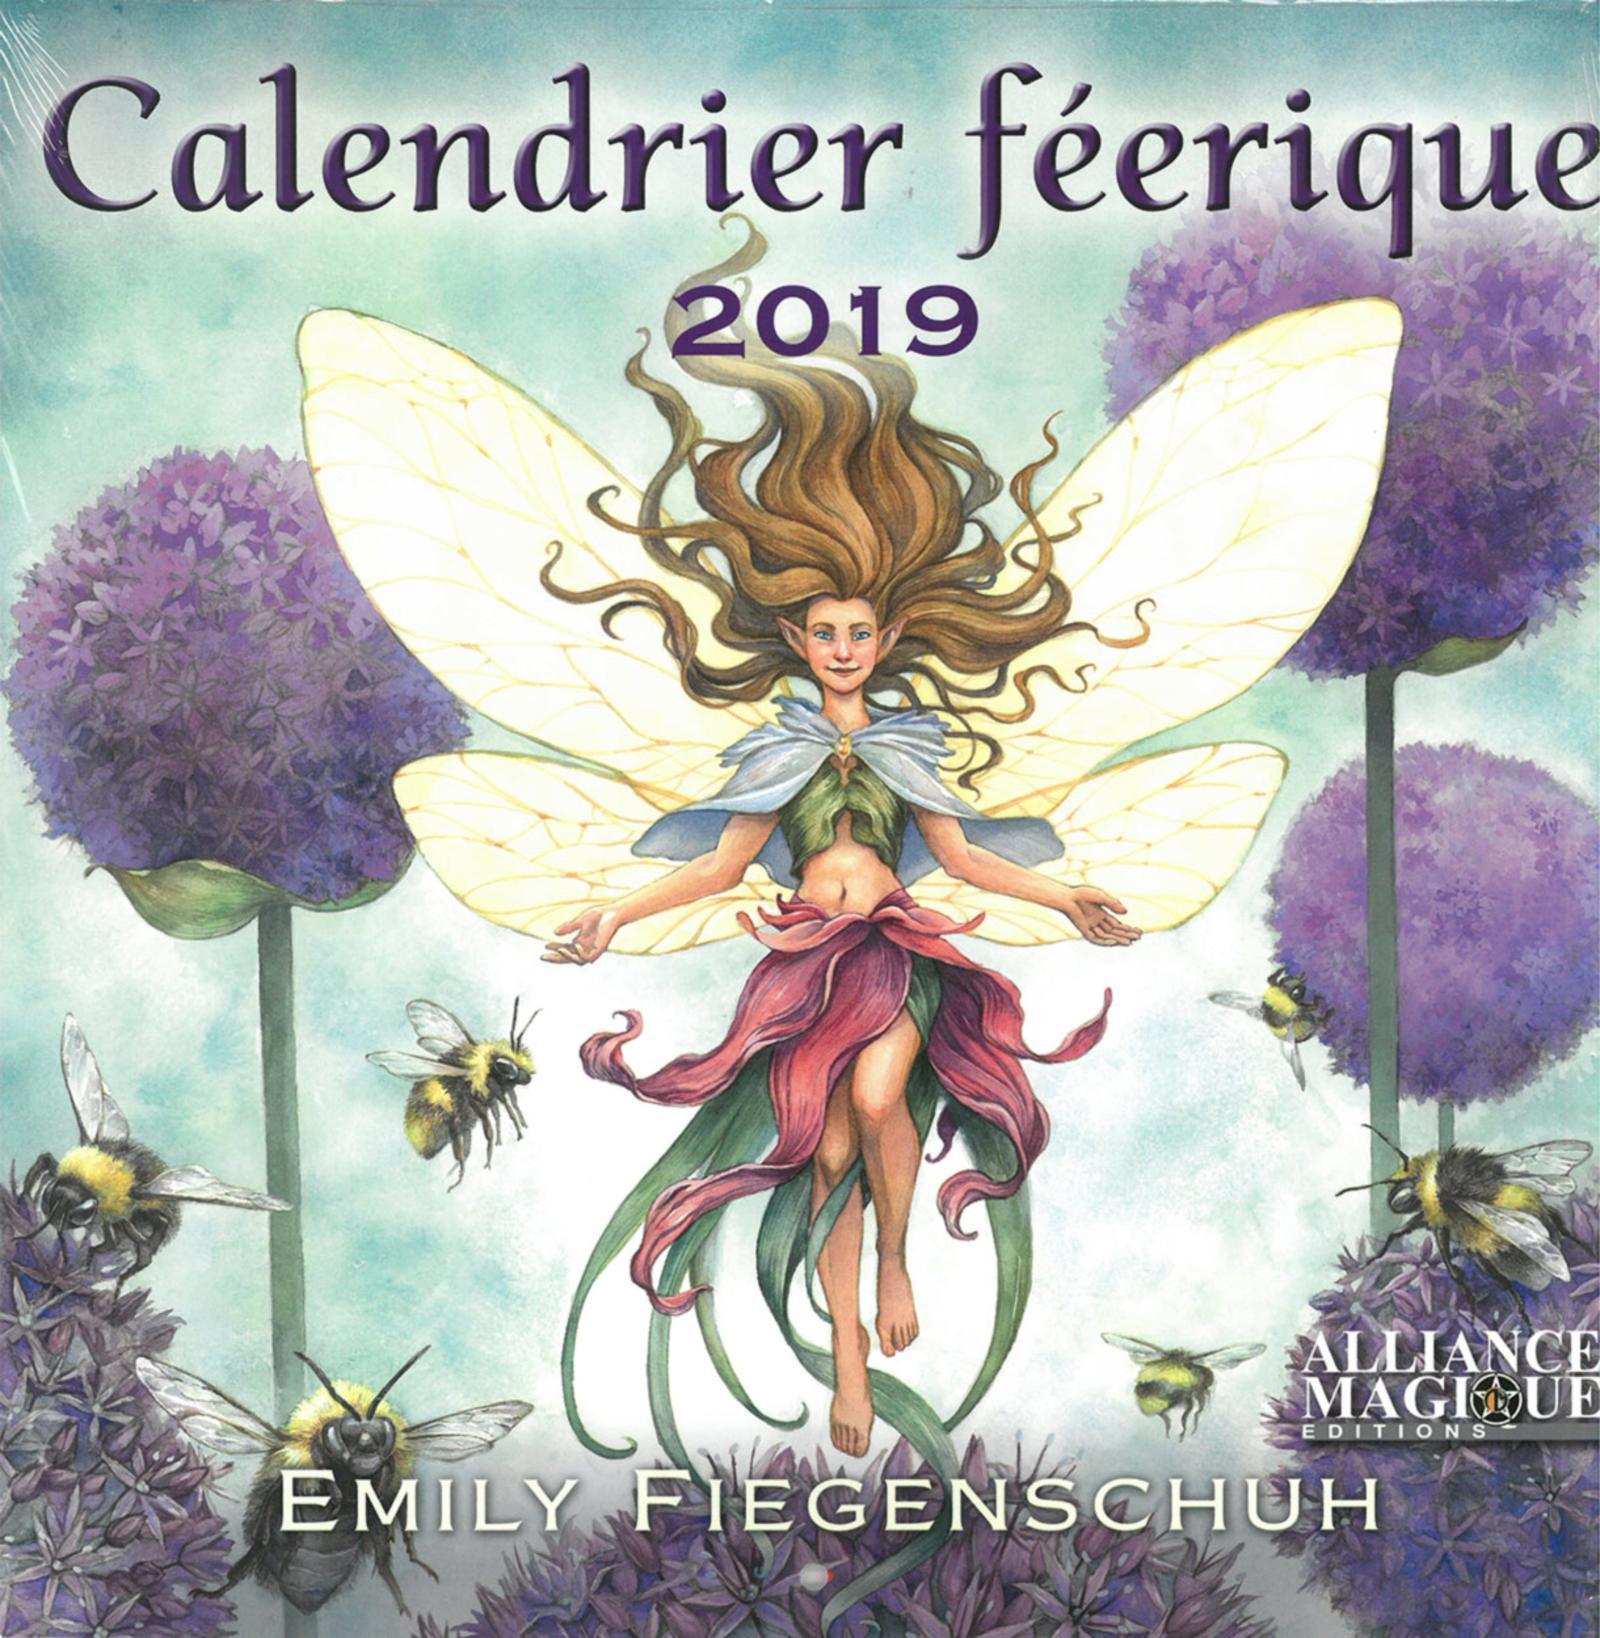 CALENDRIER DES FEERIQUE 2019 - UN VOYAGE ENCHANTEUR DANS UN MONDE MAGINQUE EN COMPAGNIE DES FEES